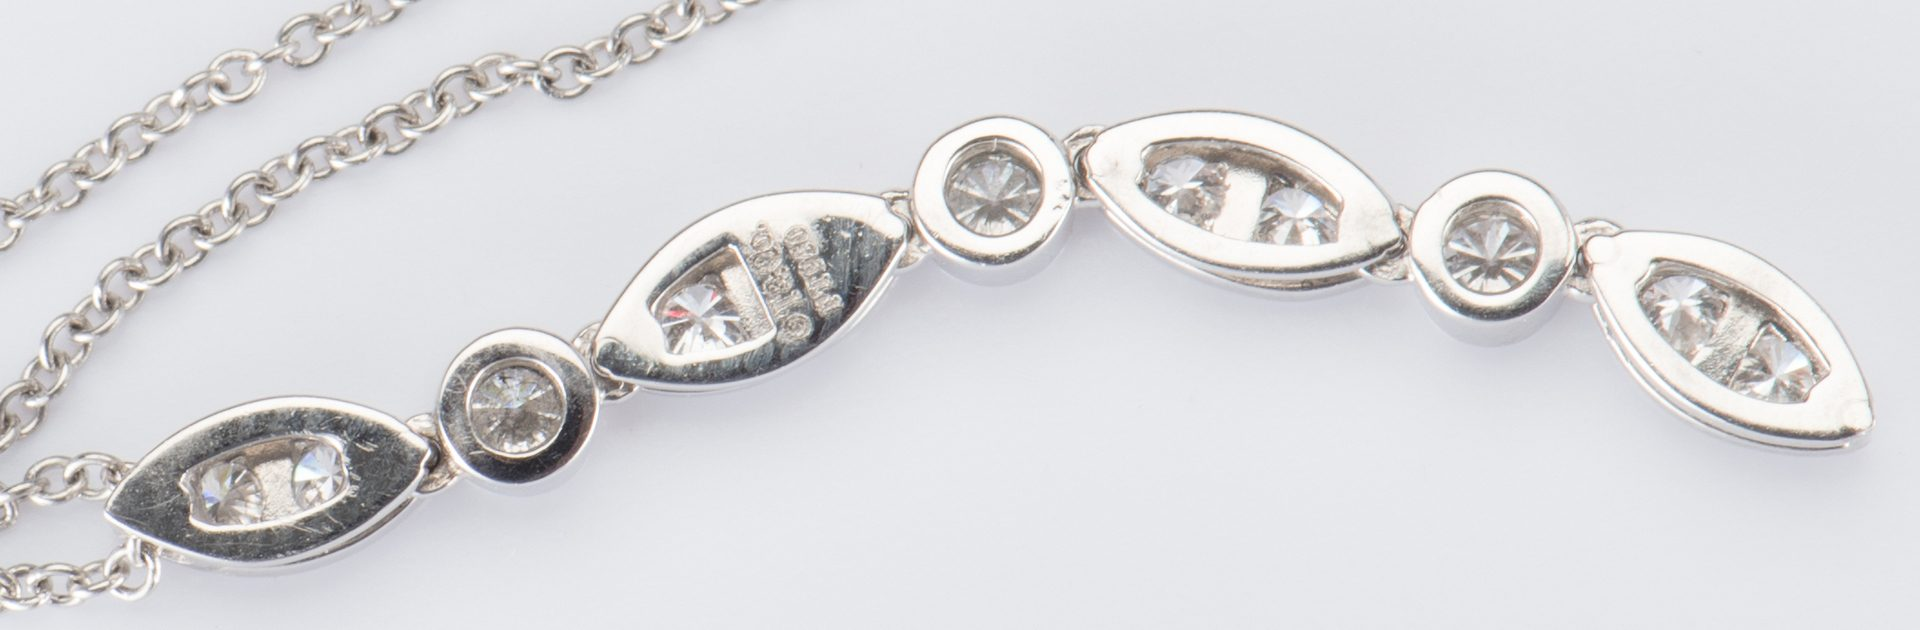 Lot 318: Tiffany Designer Plat Diamond Necklace